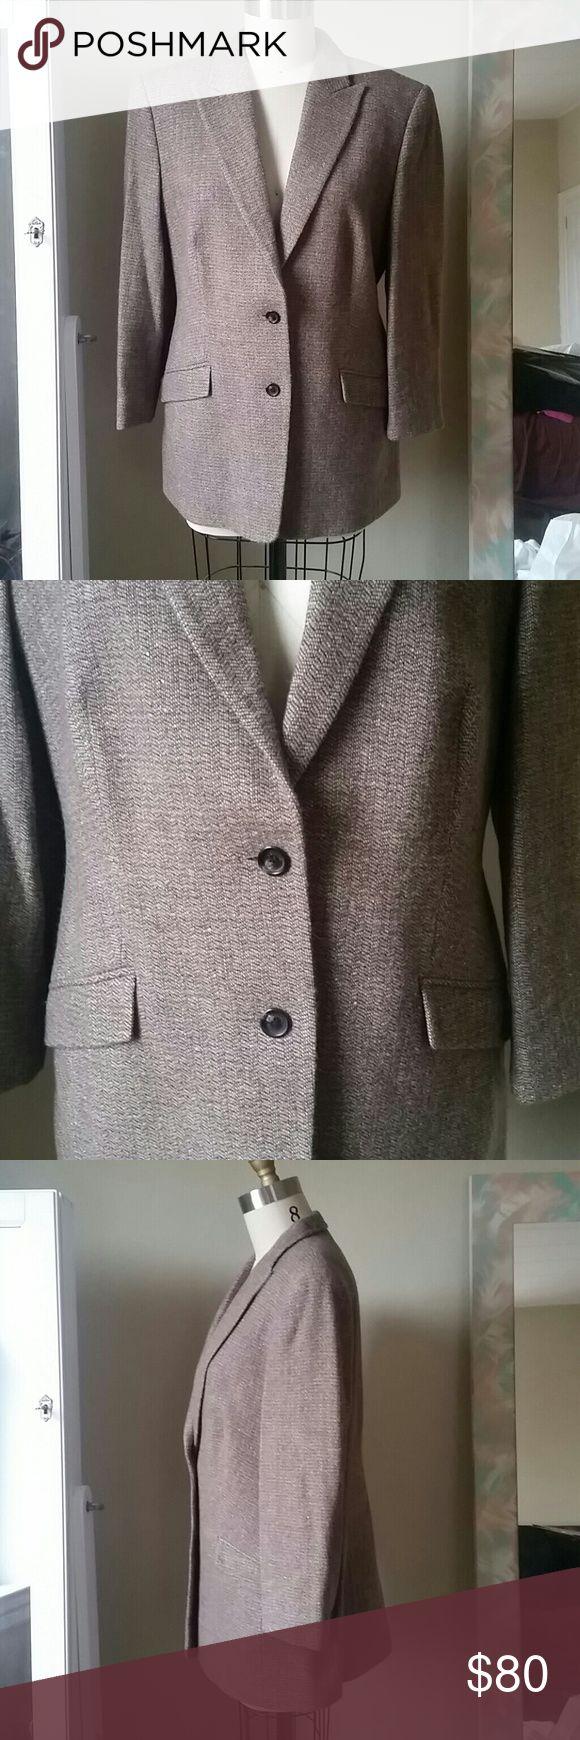 Cerruti 1881 Blazer Beautiful quality Cerruti 1881 Women's Blazer. Never worn, in amazing condition. 60% Wool 30% Angora10% Mohair.  European size 42. Size 12-14/Large in US size. Jackets & Coats Blazers